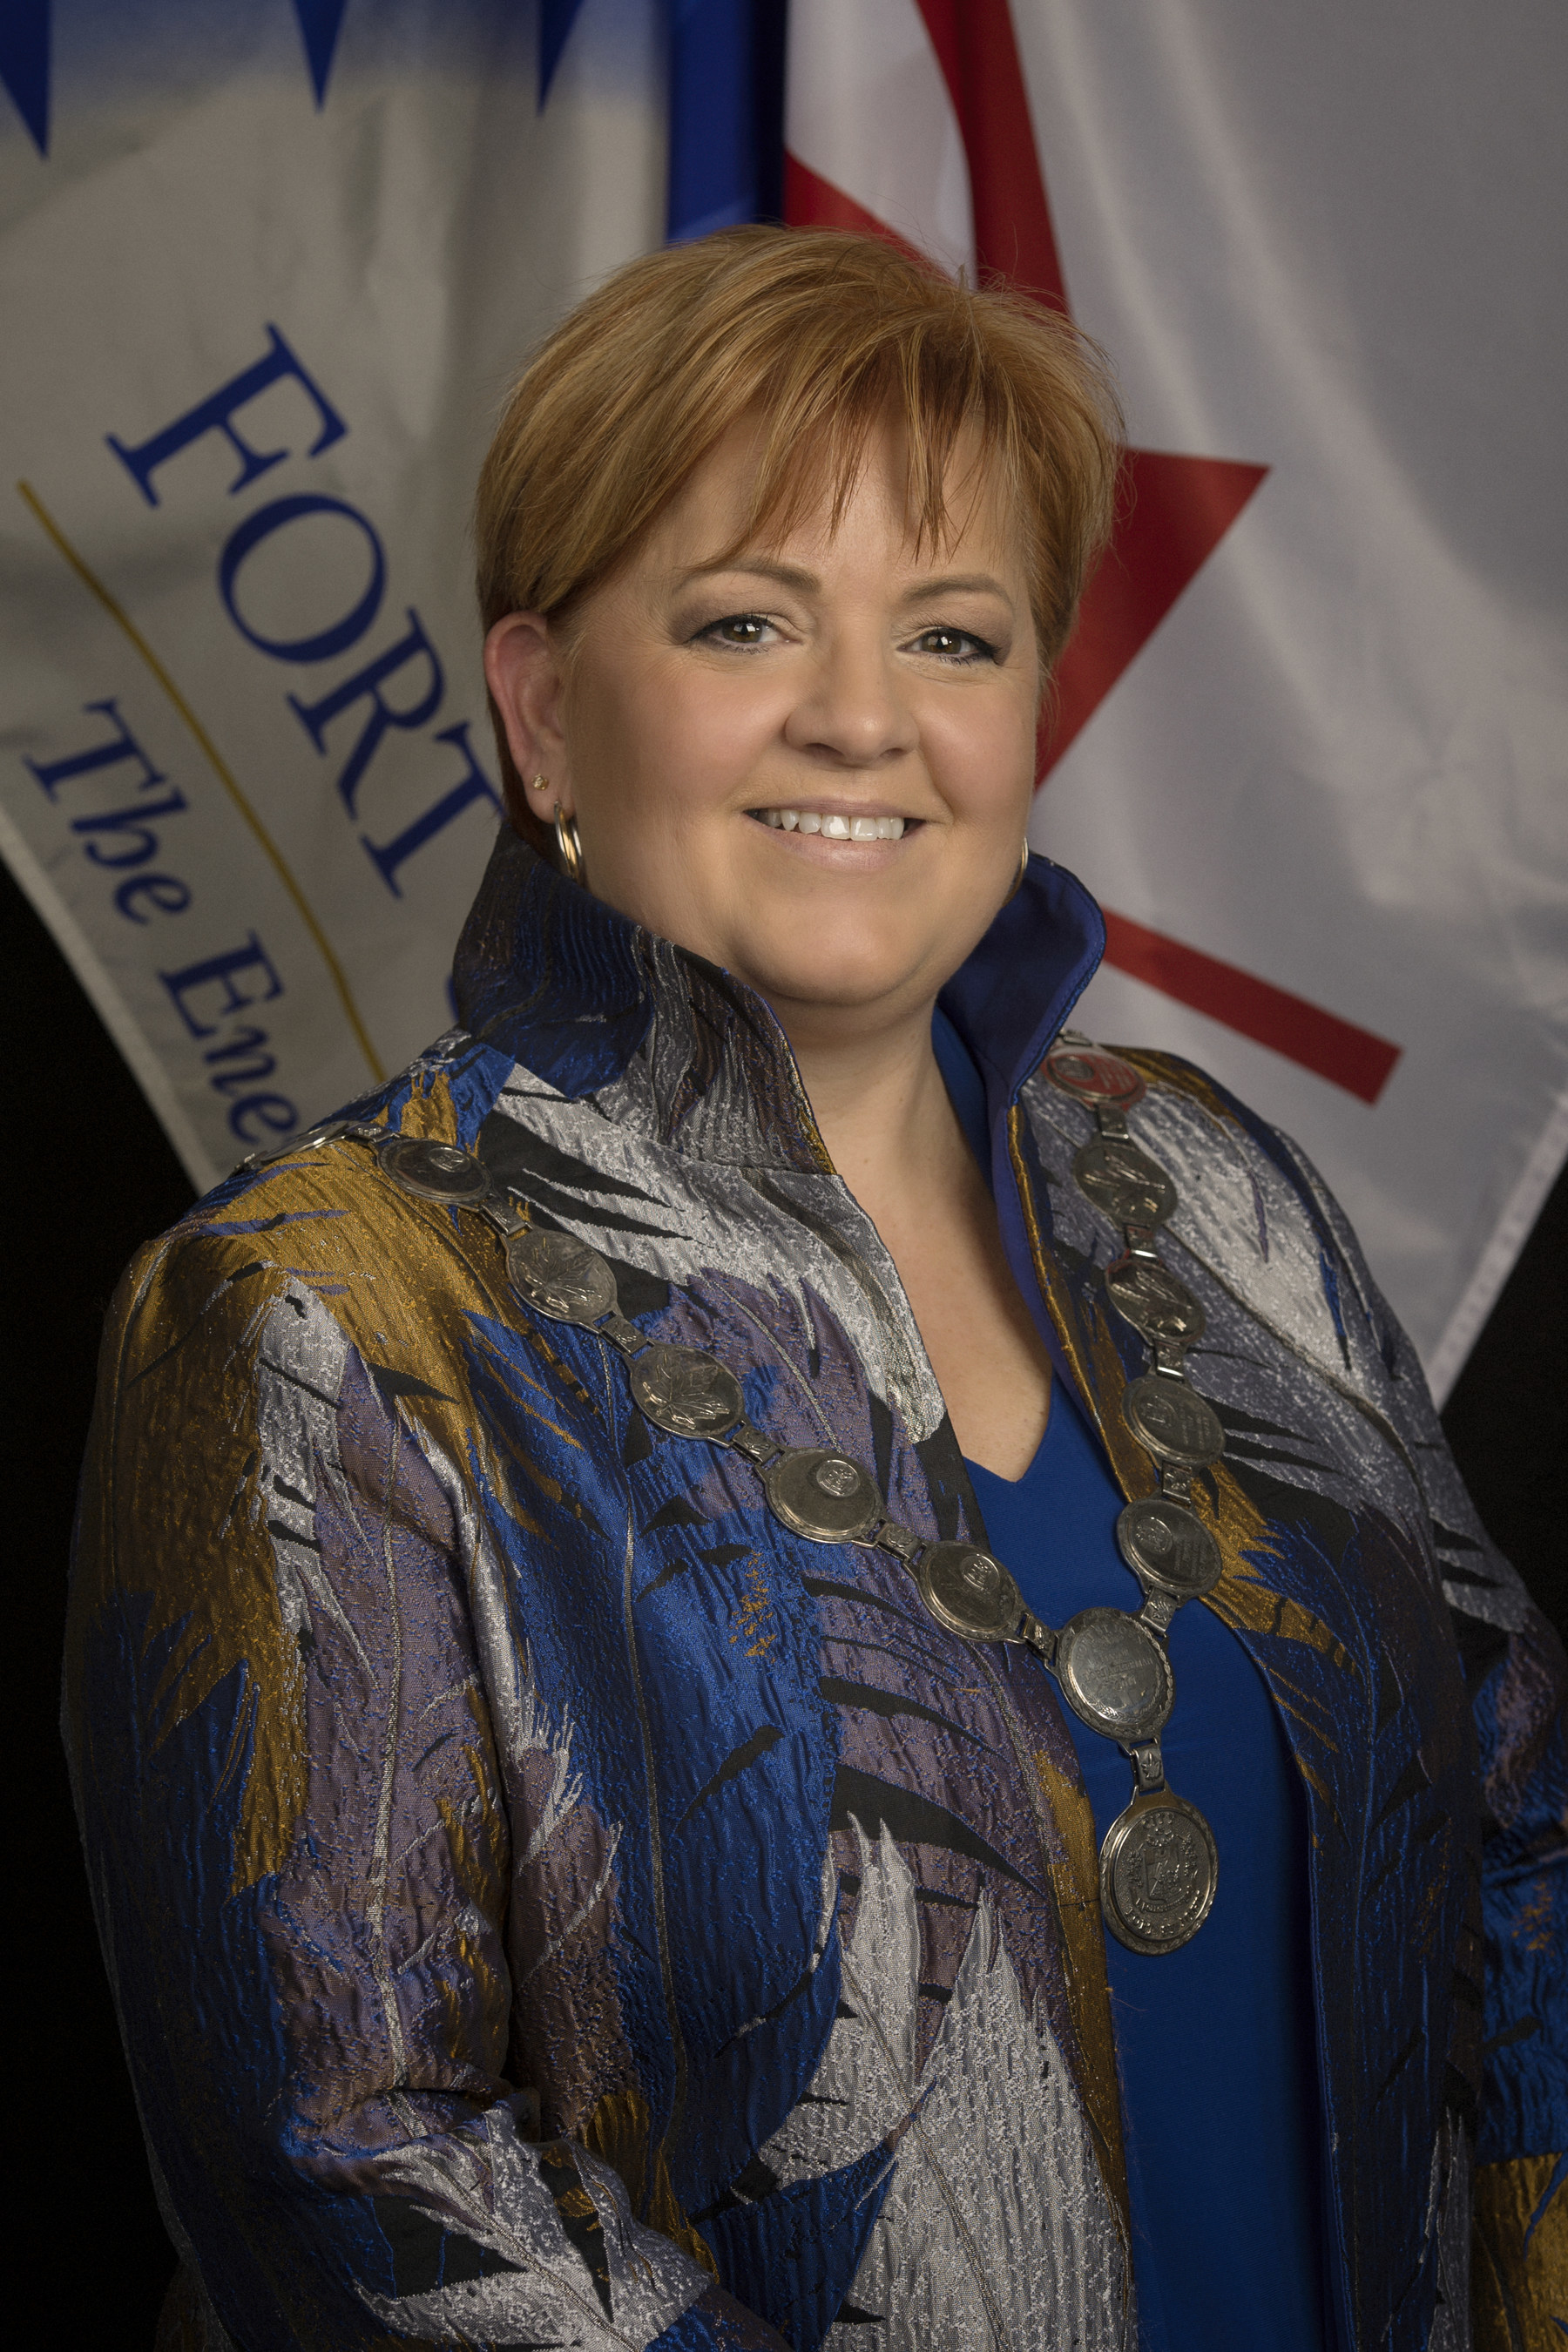 Mayor Lori Ackerman, Fort St. John B.C. (CNW Group/Energy Council of Canada)